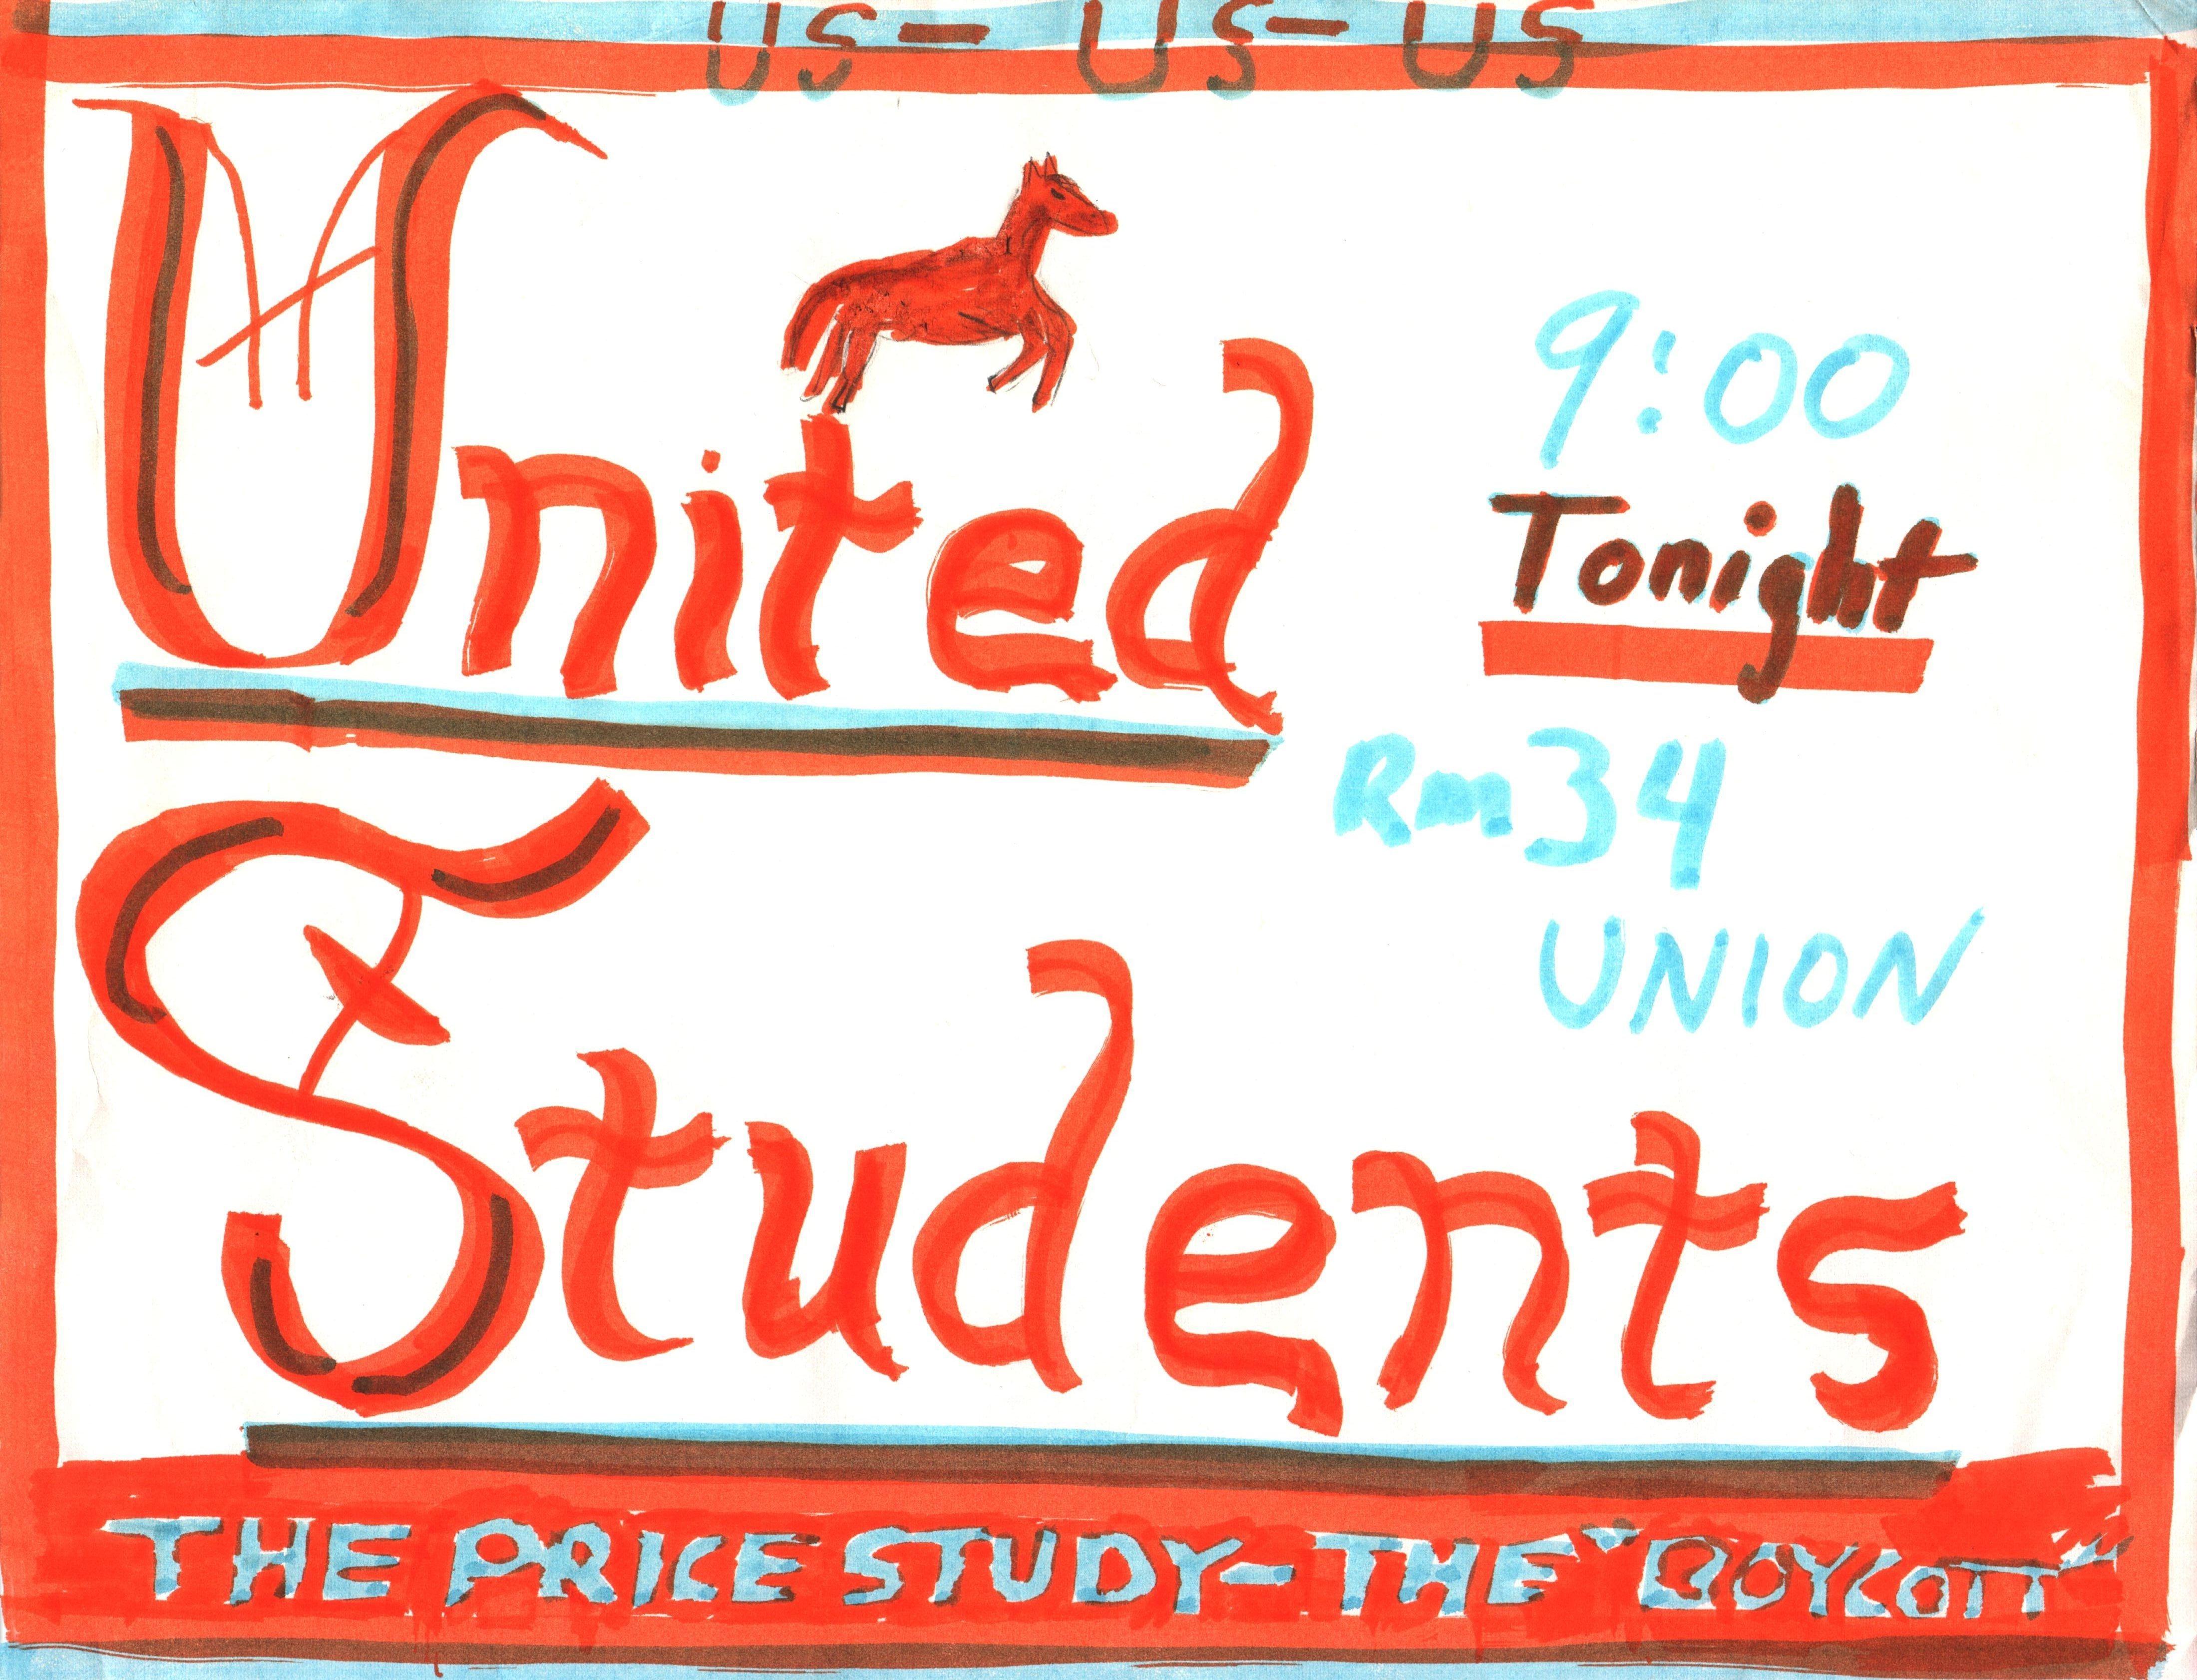 Orange Horse Rally November 15, 1966